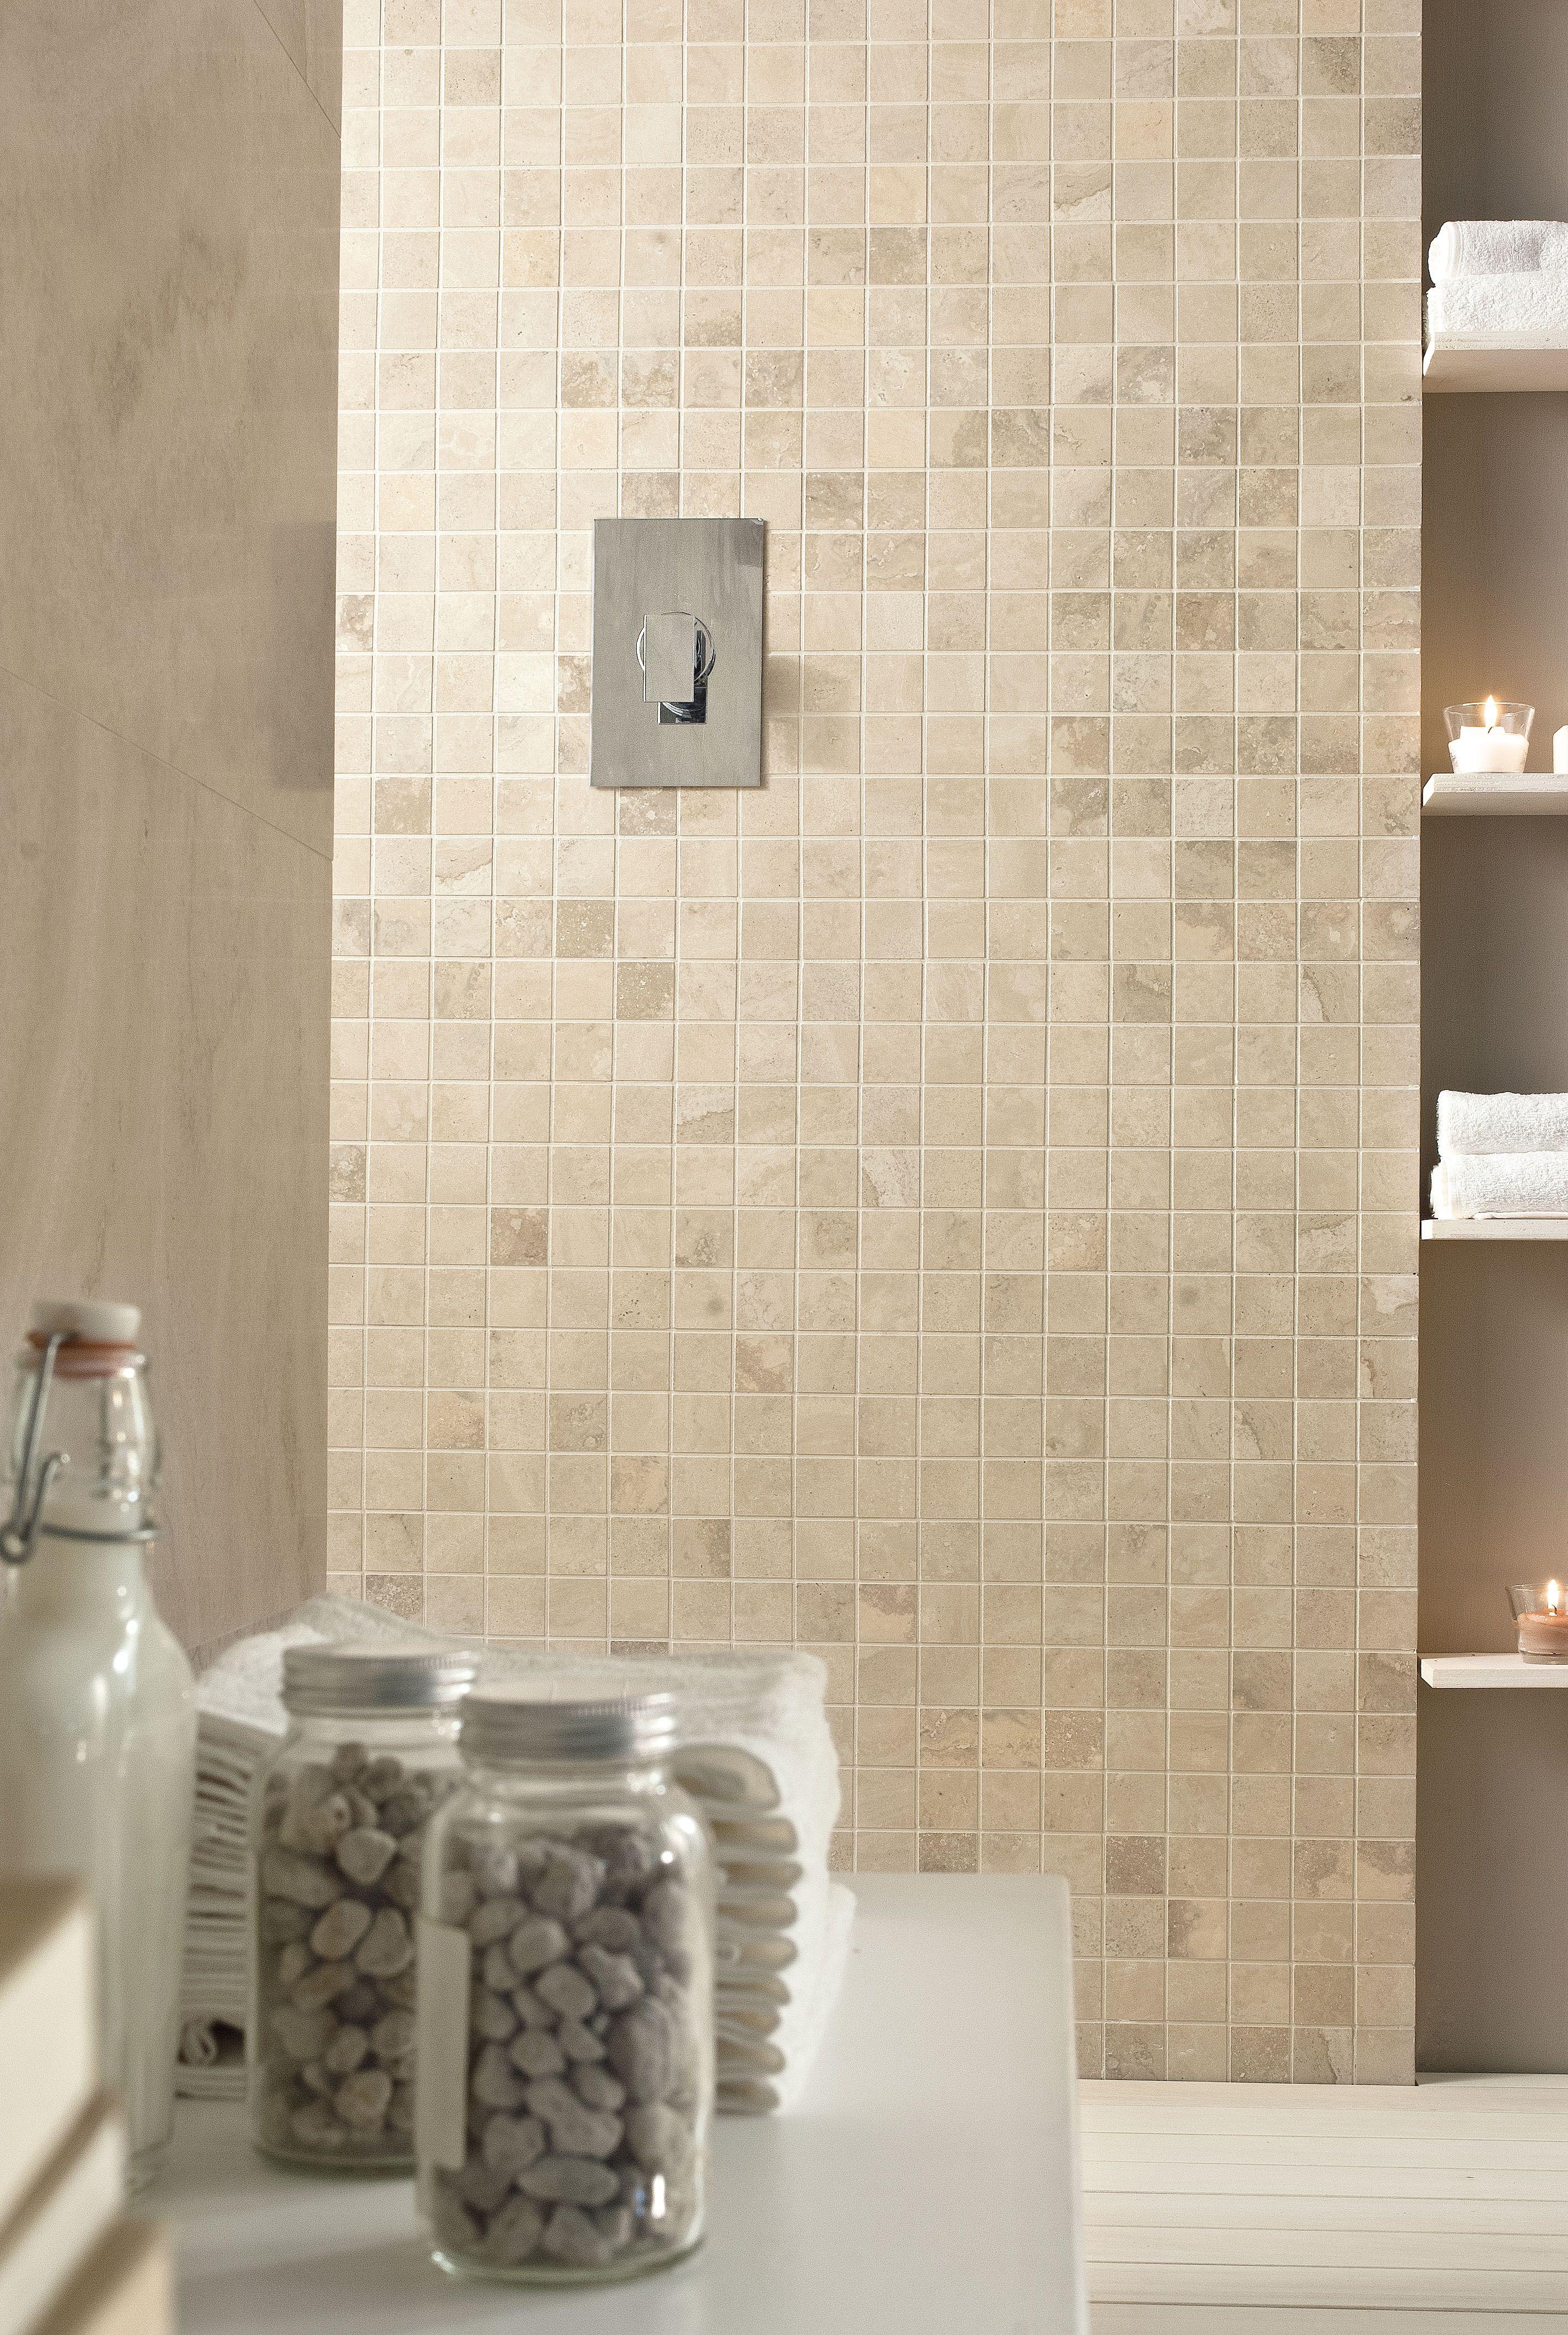 Vallelunga Caracalla Avorio & Mosaic | Travertine Look Tile ...